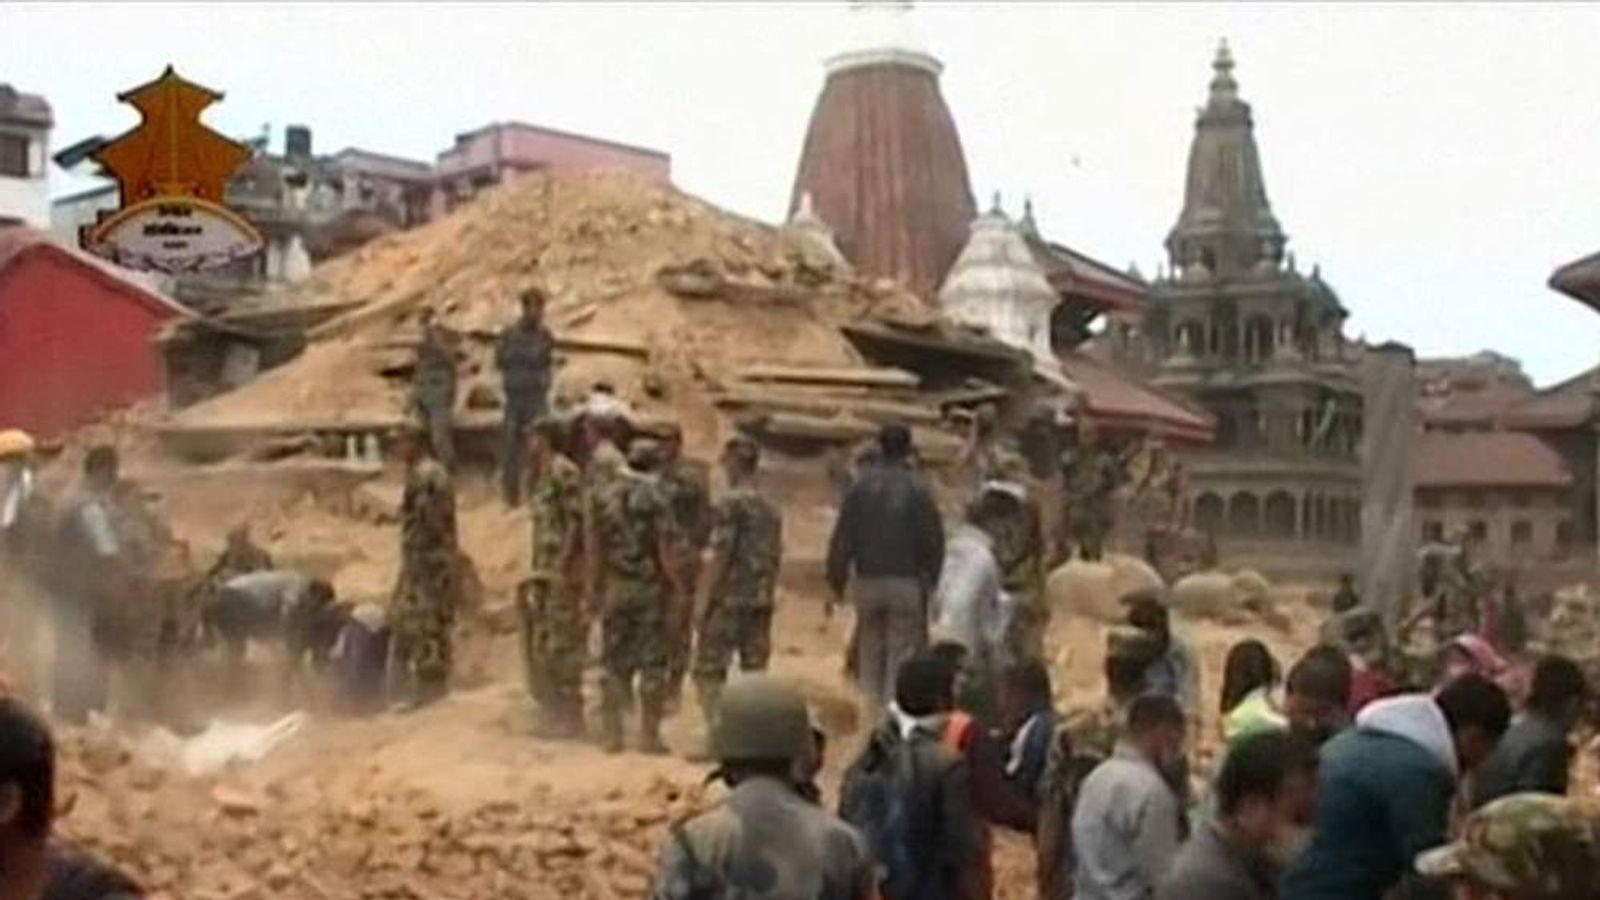 NEPAL EARTHQUAKE SEARCH CREWS DIGGING